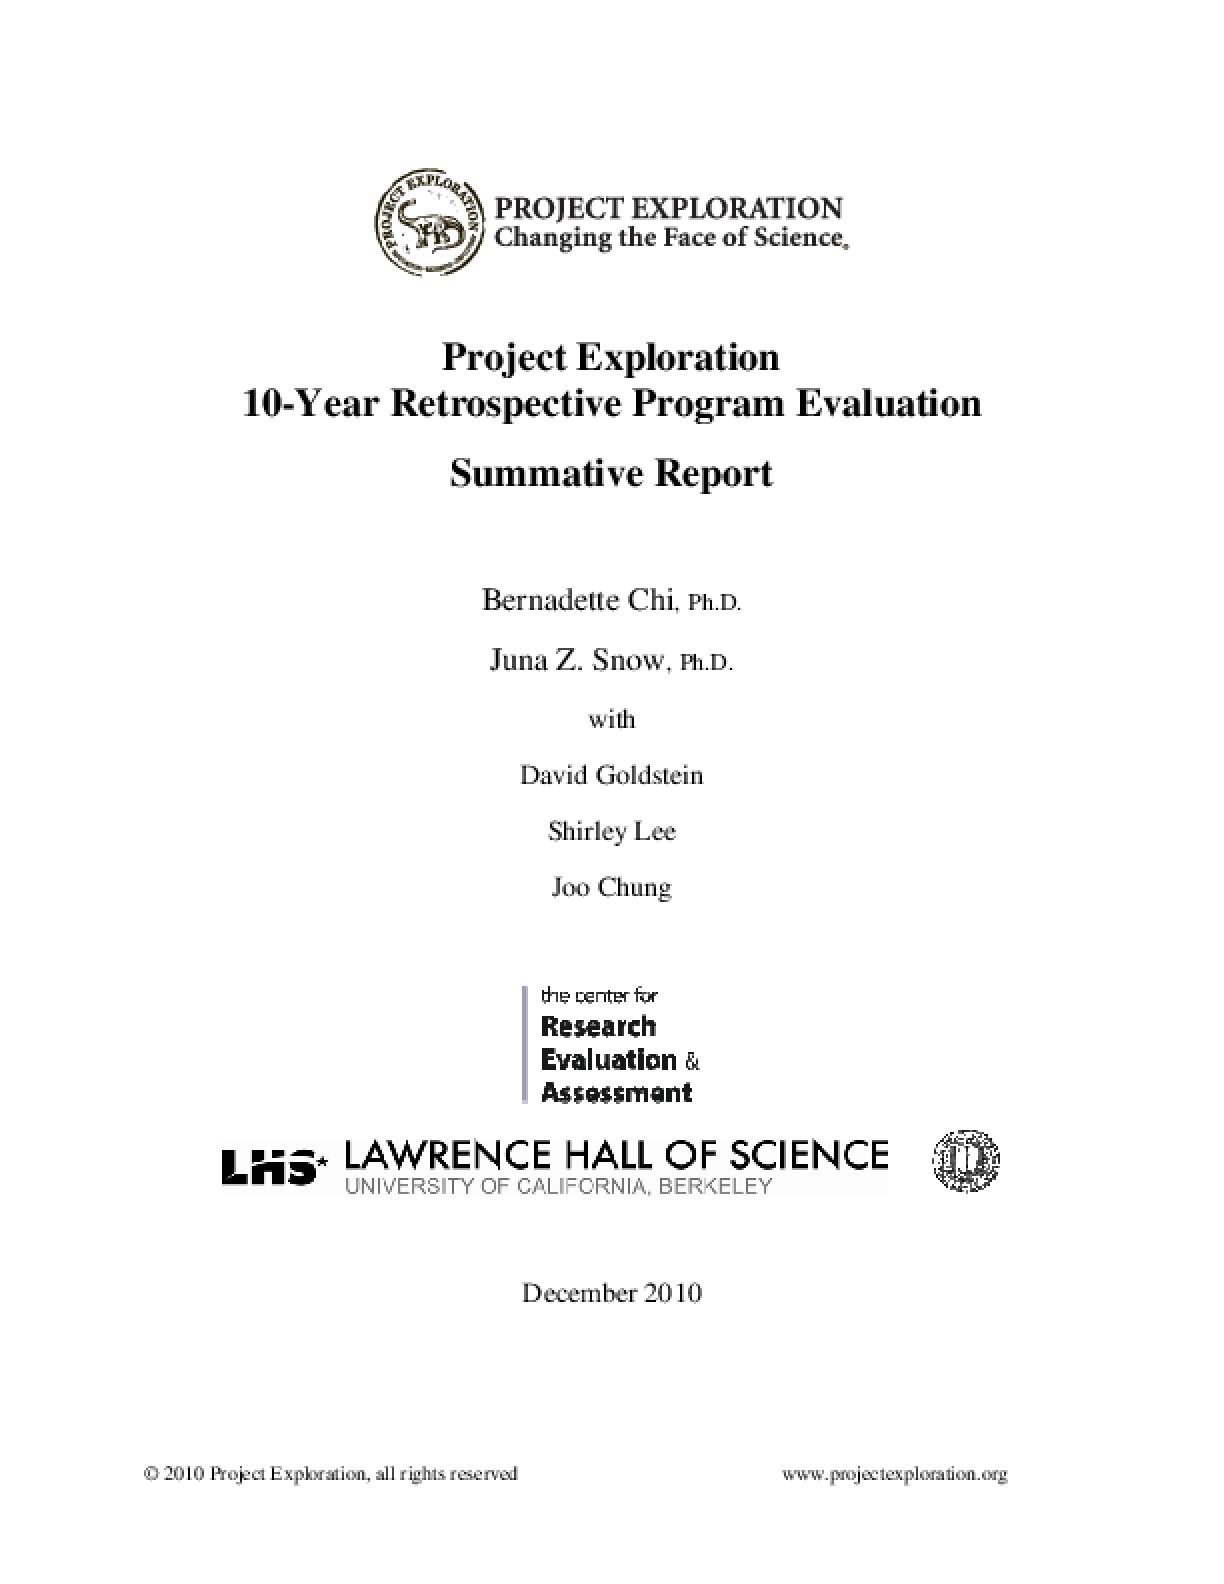 Project Exploration: 10-year Retrospective Program Evaluation